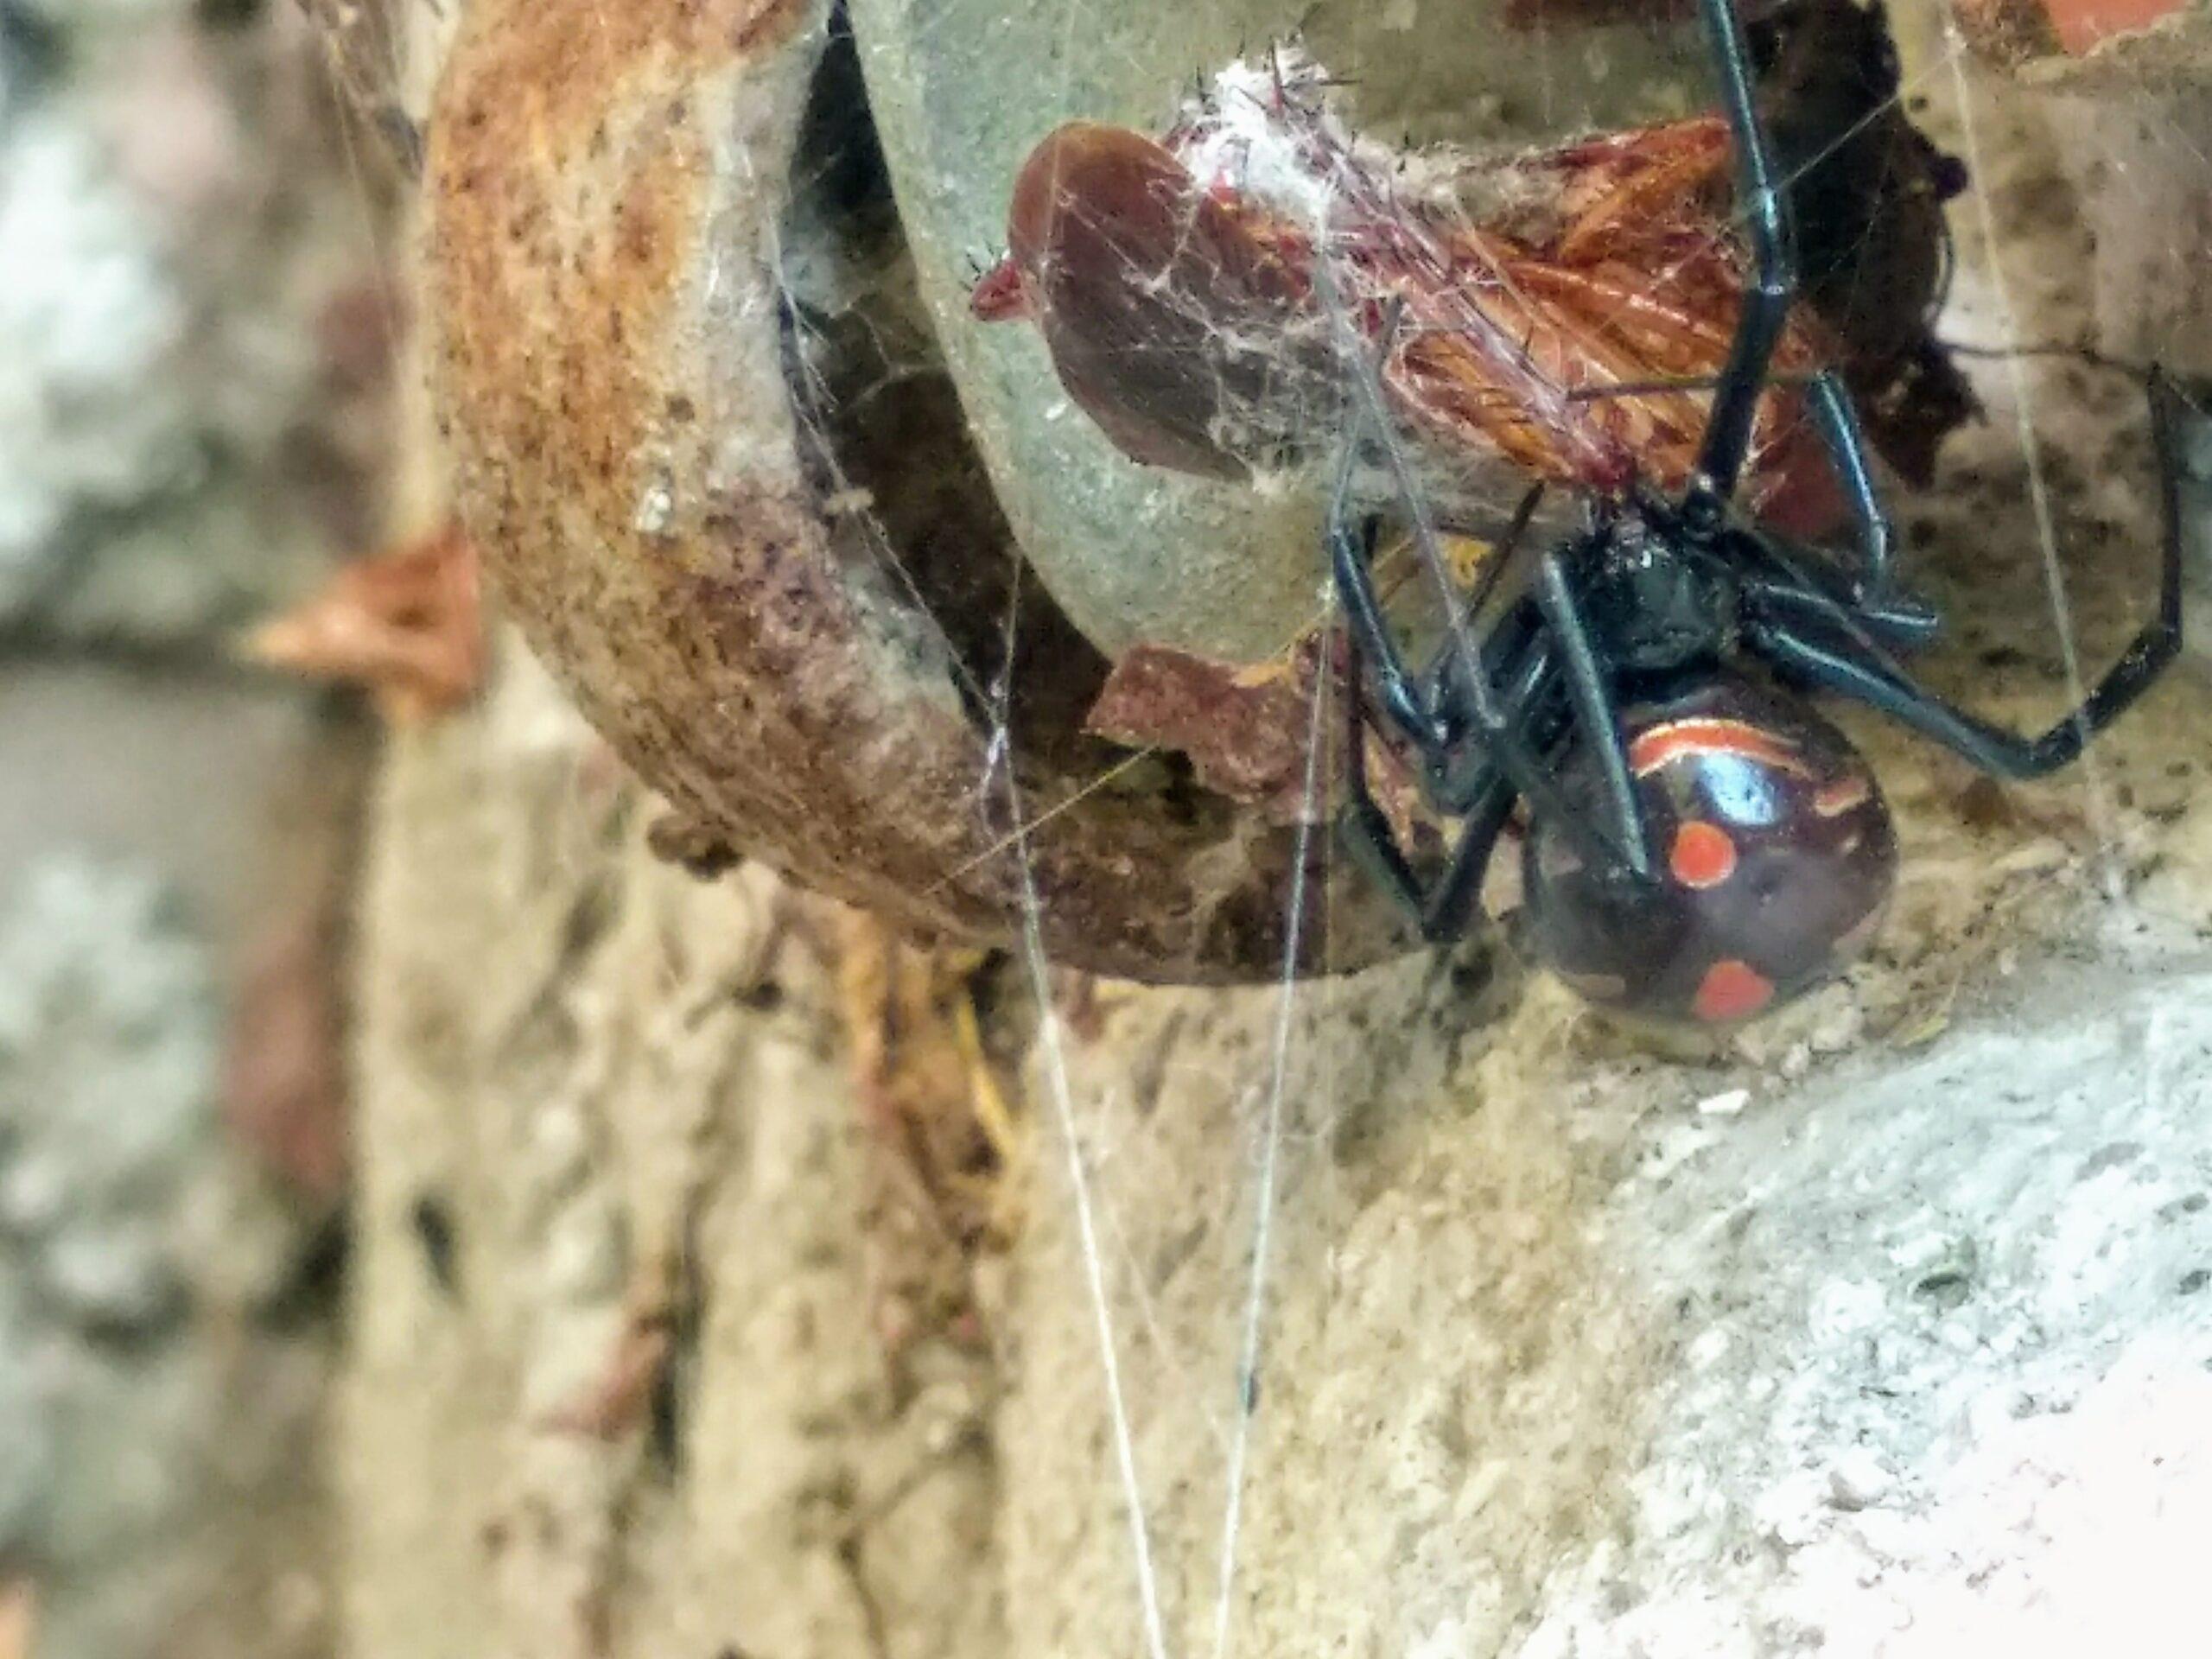 Araña Viuda Negra comiendo insecto - Wiki Animales